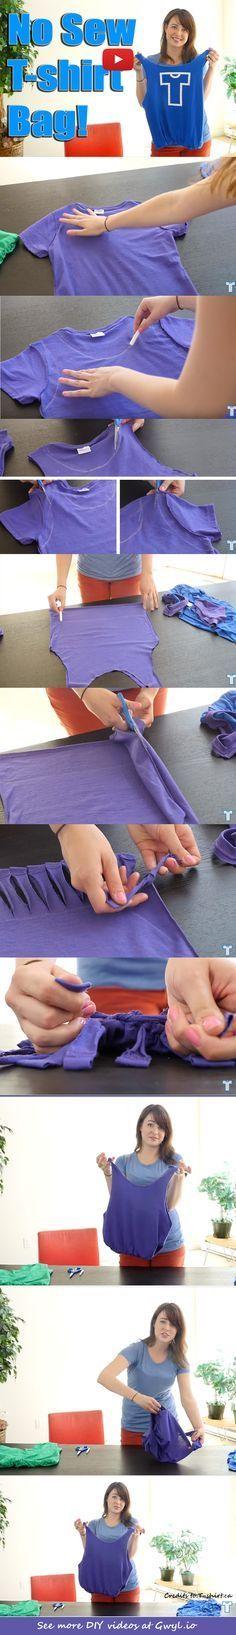 Make A No Sew T-Shirt Tote Bag In 10 Minutes #nosewshirts